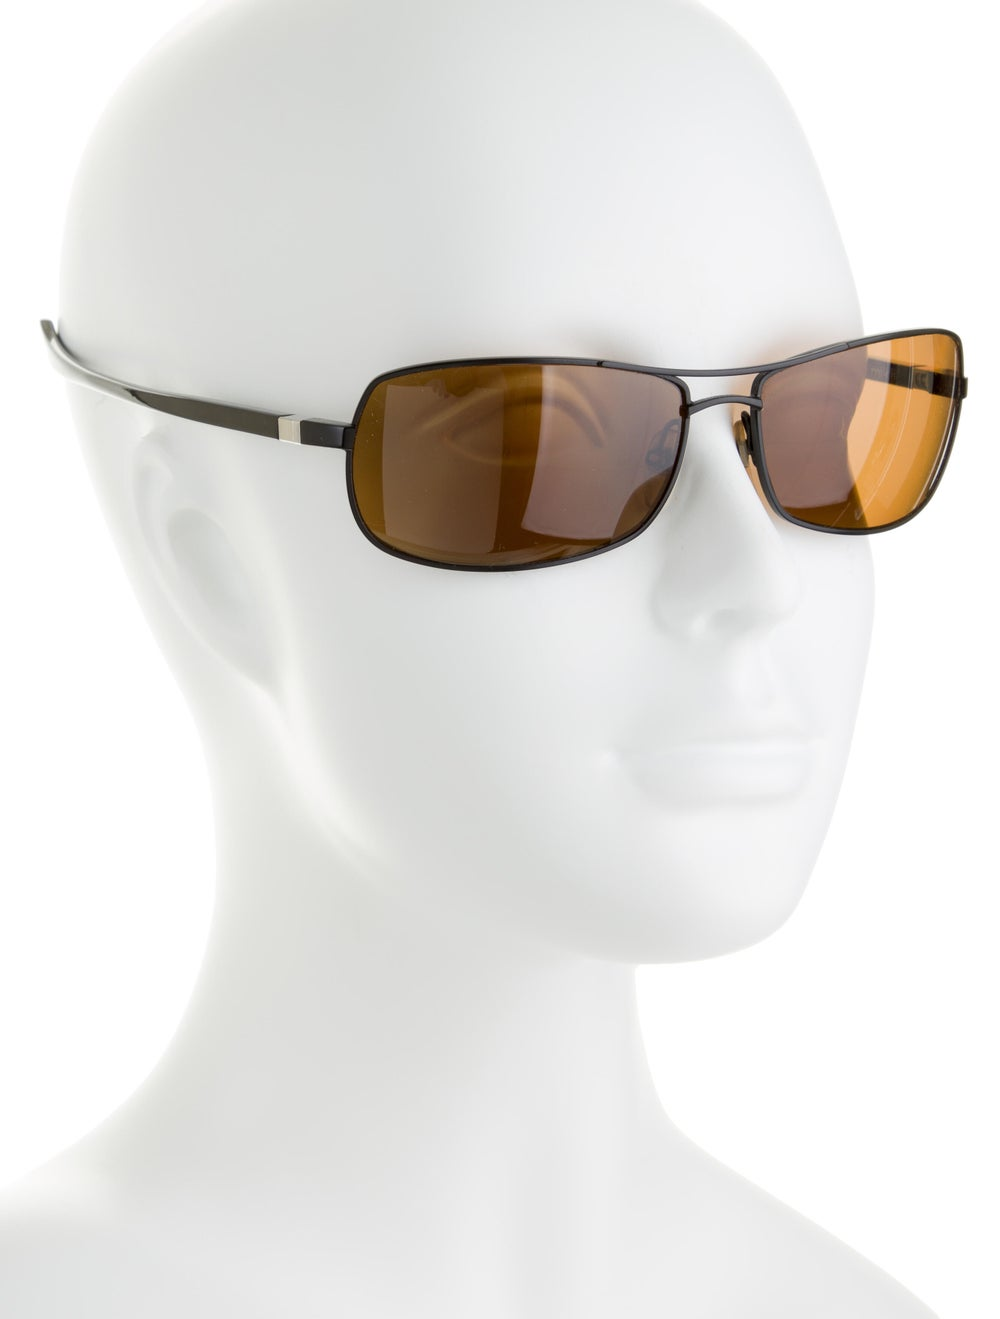 Alain Mikli Square Aviator Sunglasses brown - image 4